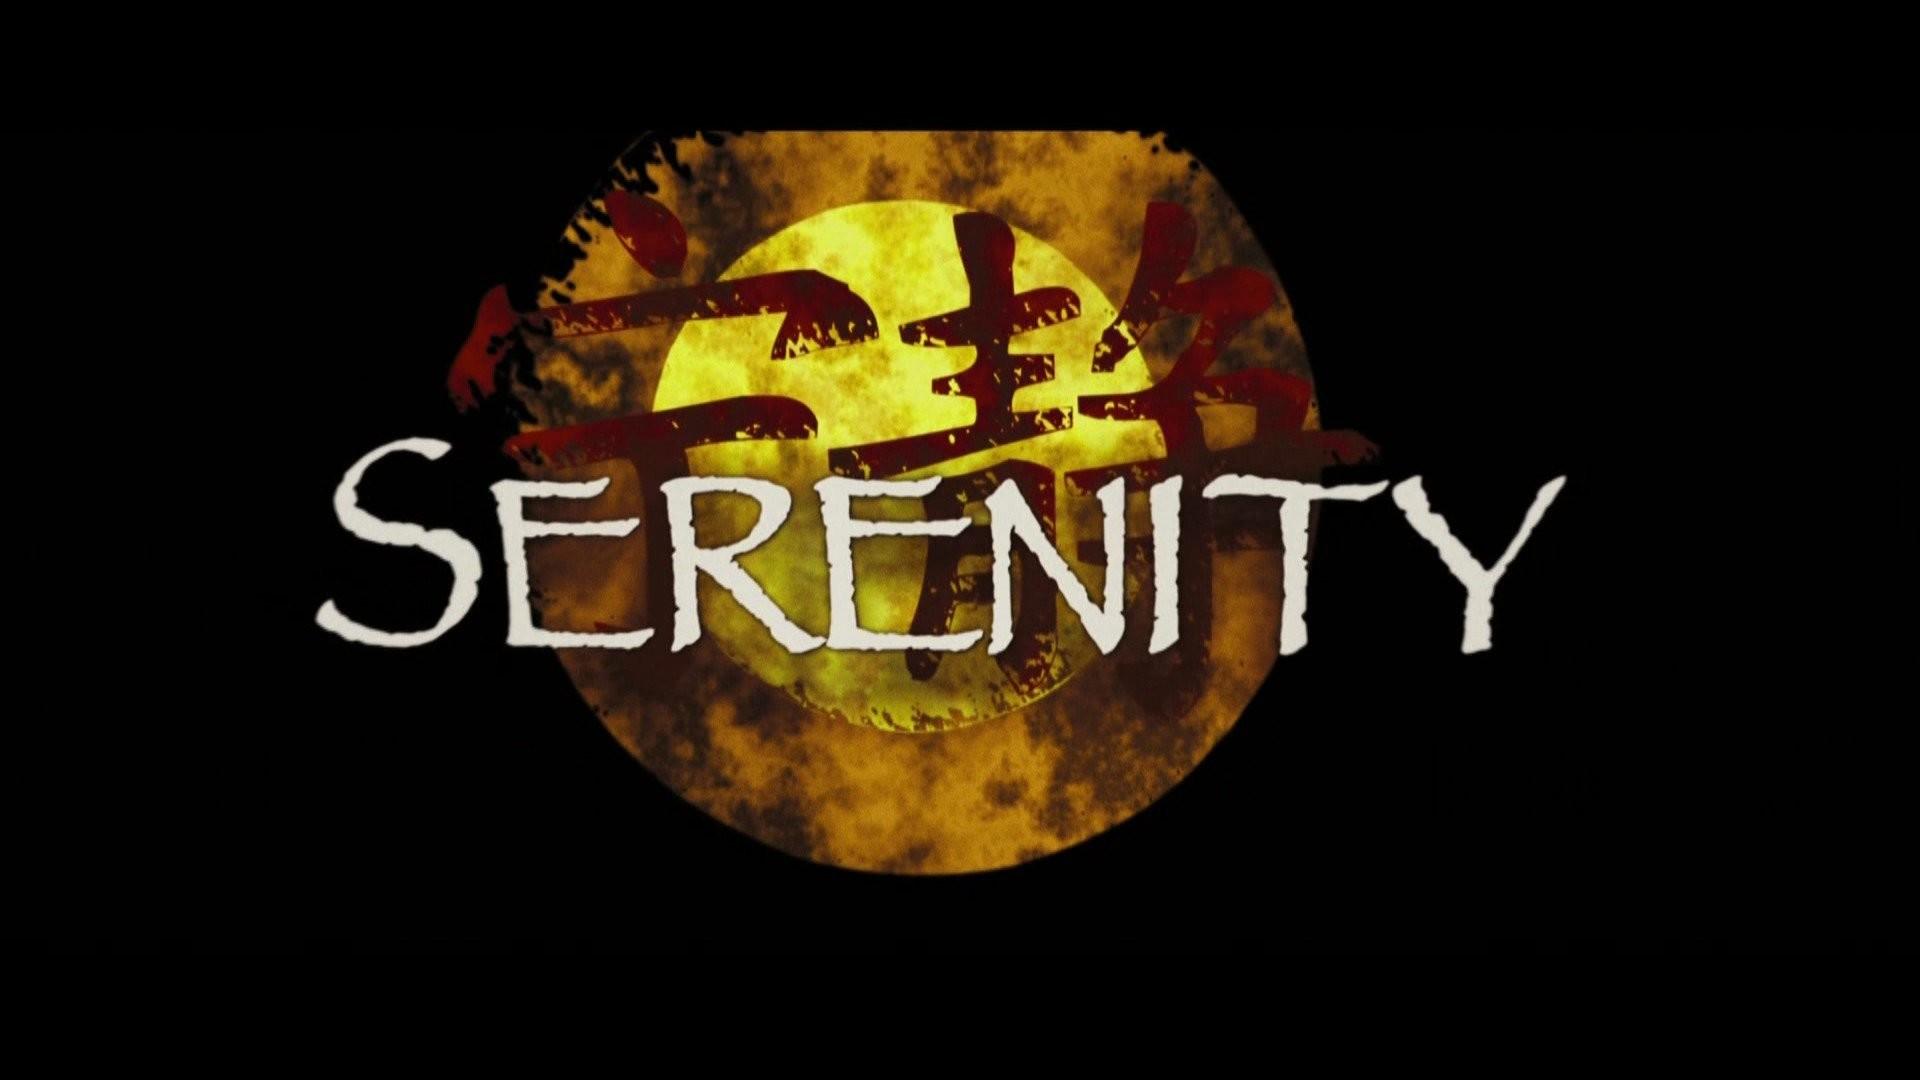 Serenity Firefly Screensaver